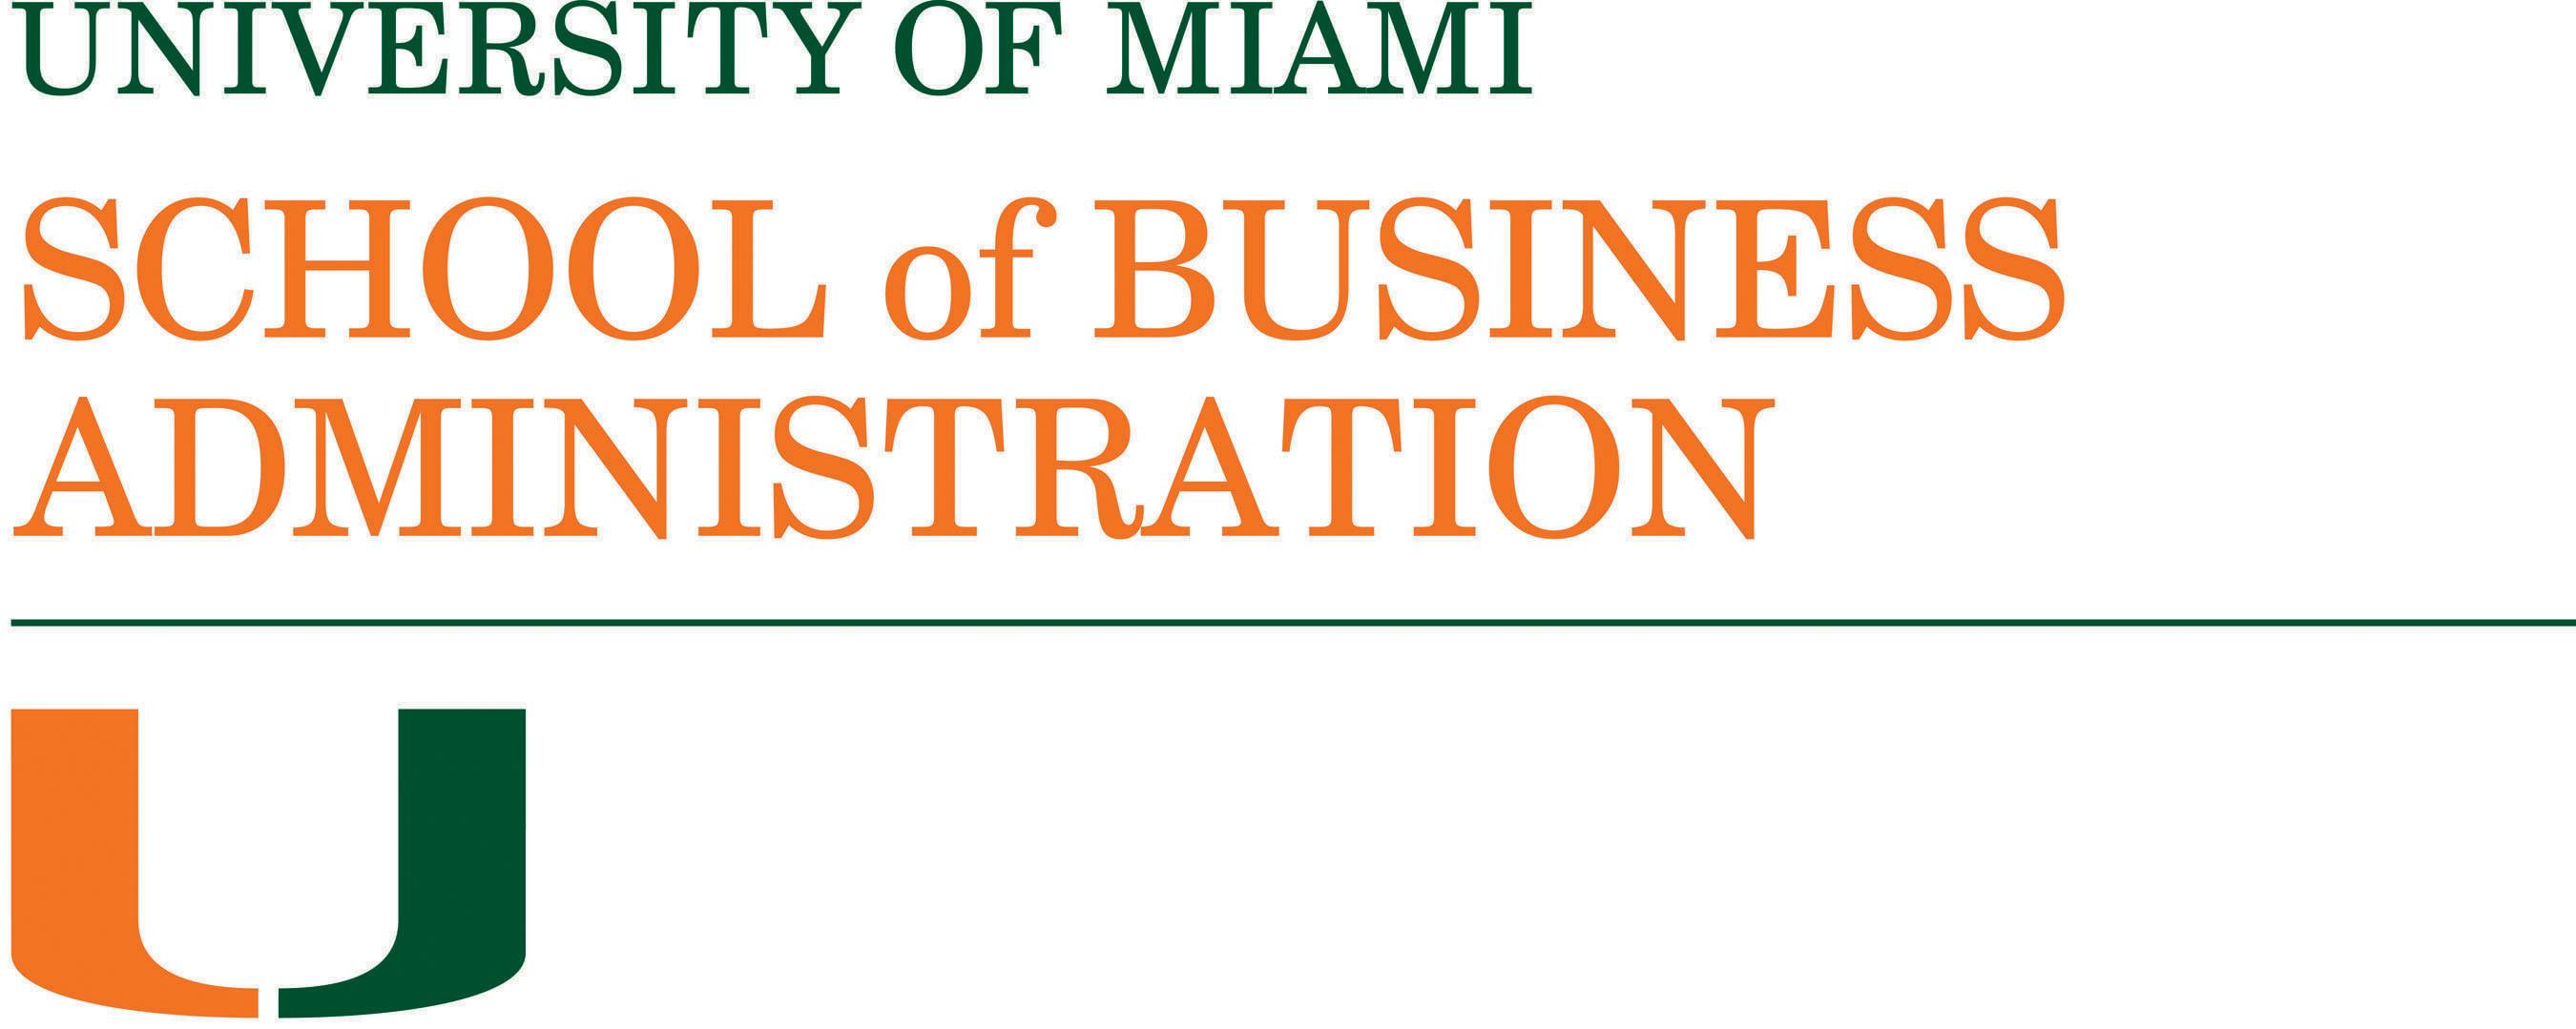 University of Miami School of Business Administration Logo.